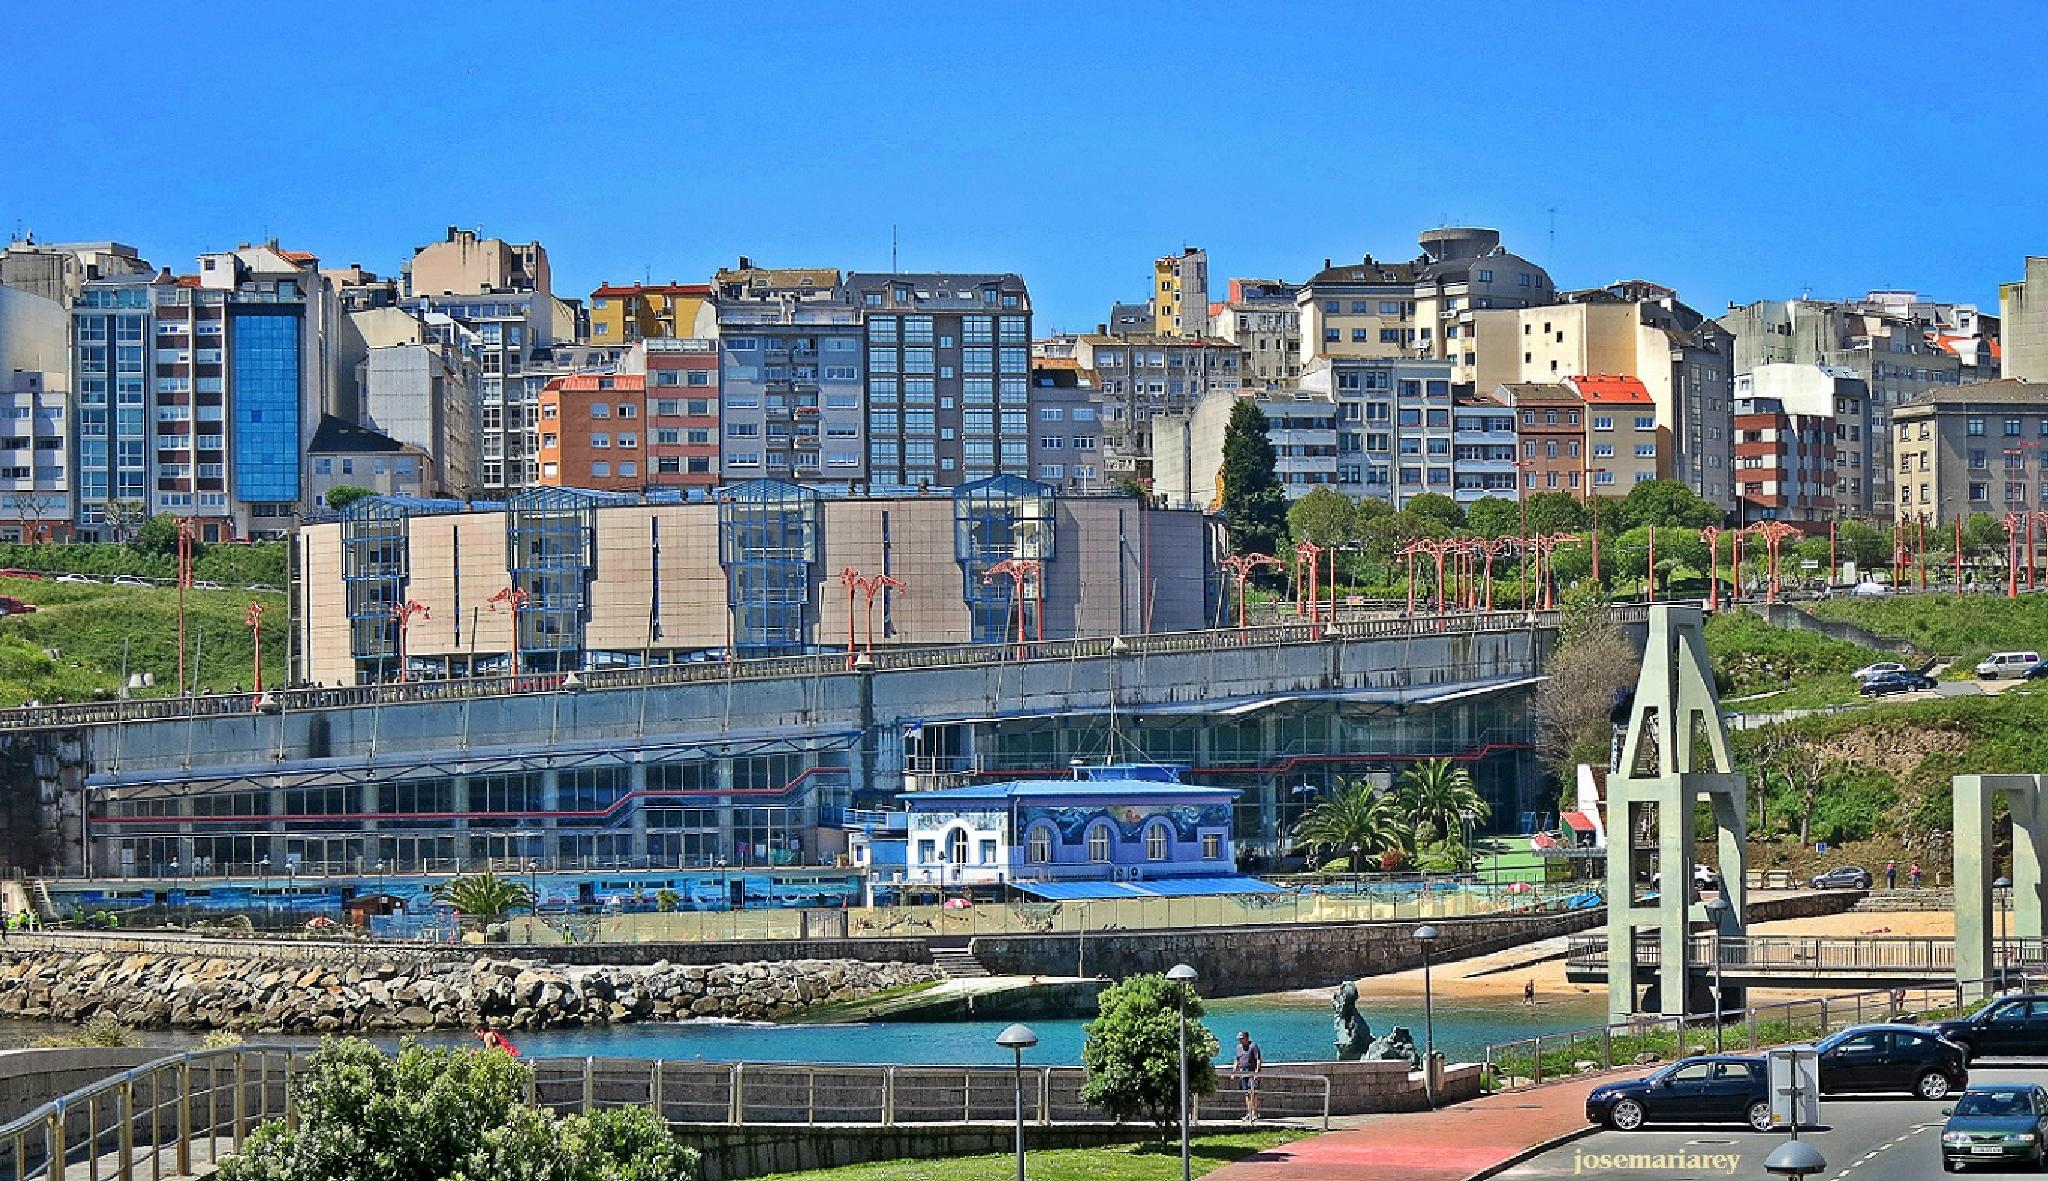 Club del Mar by josemariareymontes